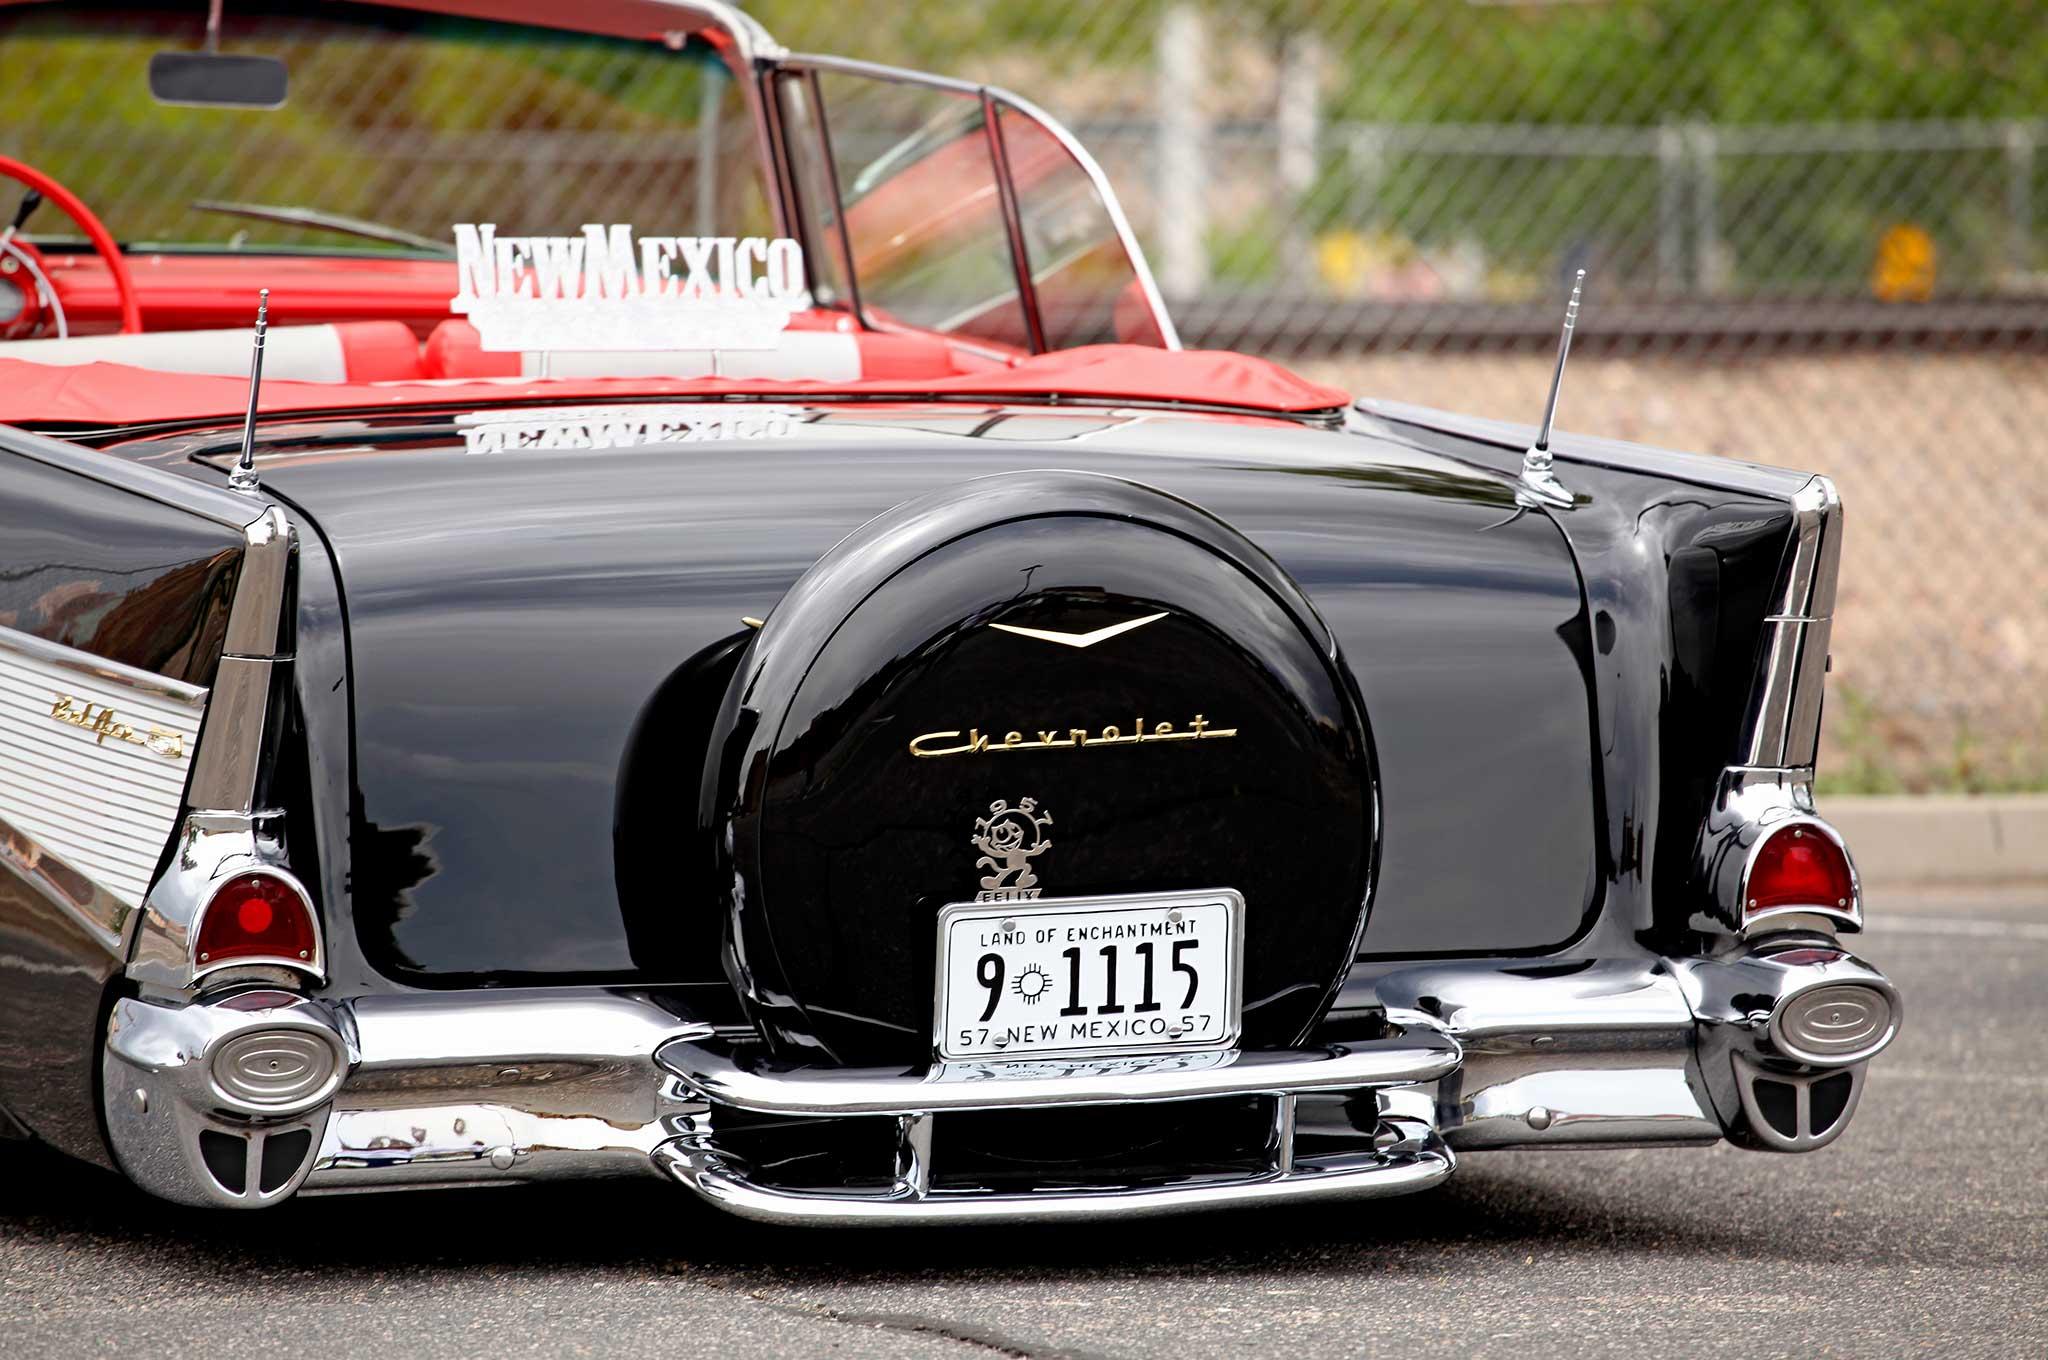 1957 Chevy Bel Air Convertible - Dream Catcher - Lowrider